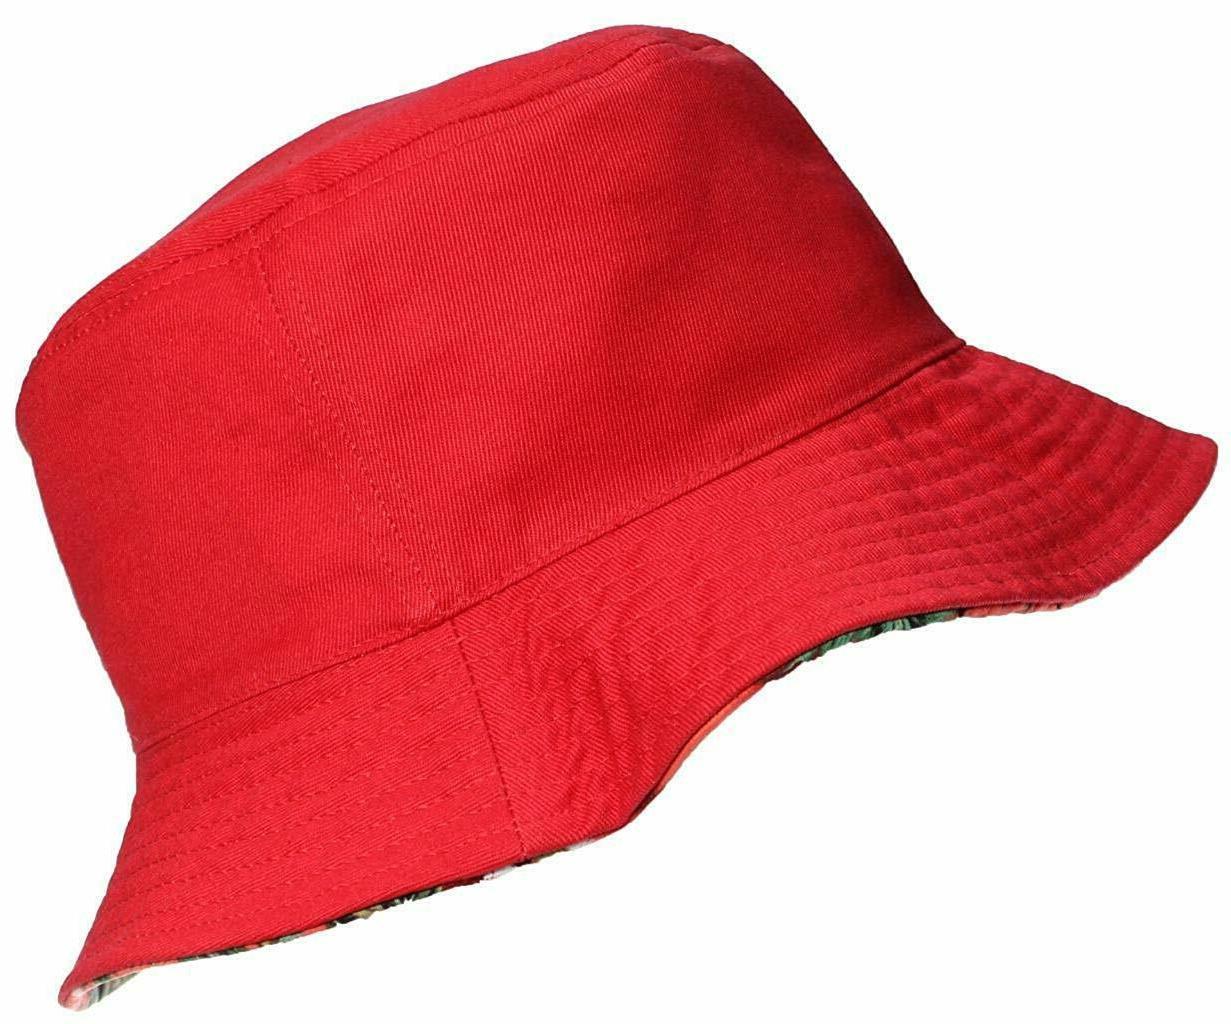 E-Flag Original Adult Reversible Tropical/Hawaiian Cotton Hat